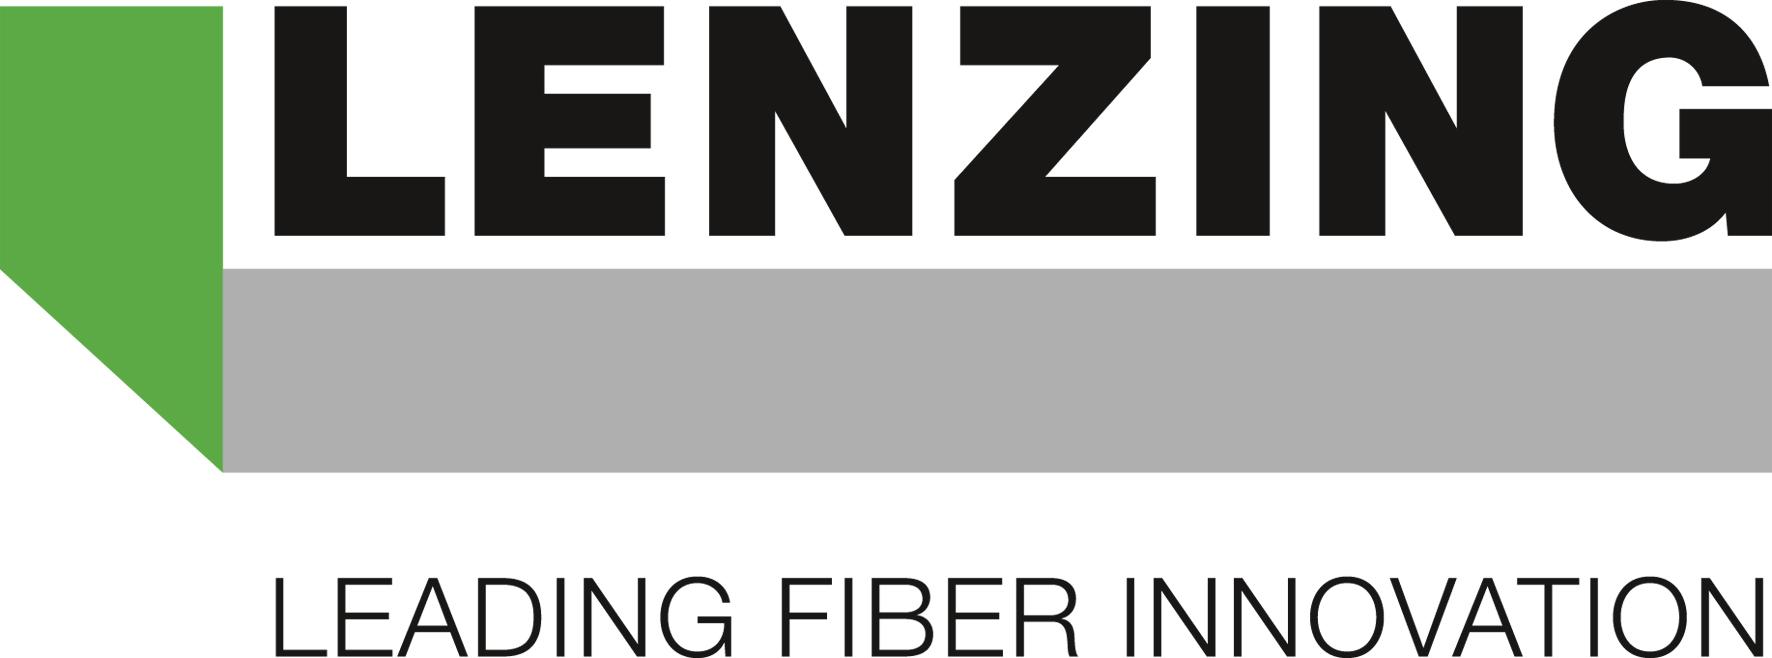 Lenzing_Logo_Leading